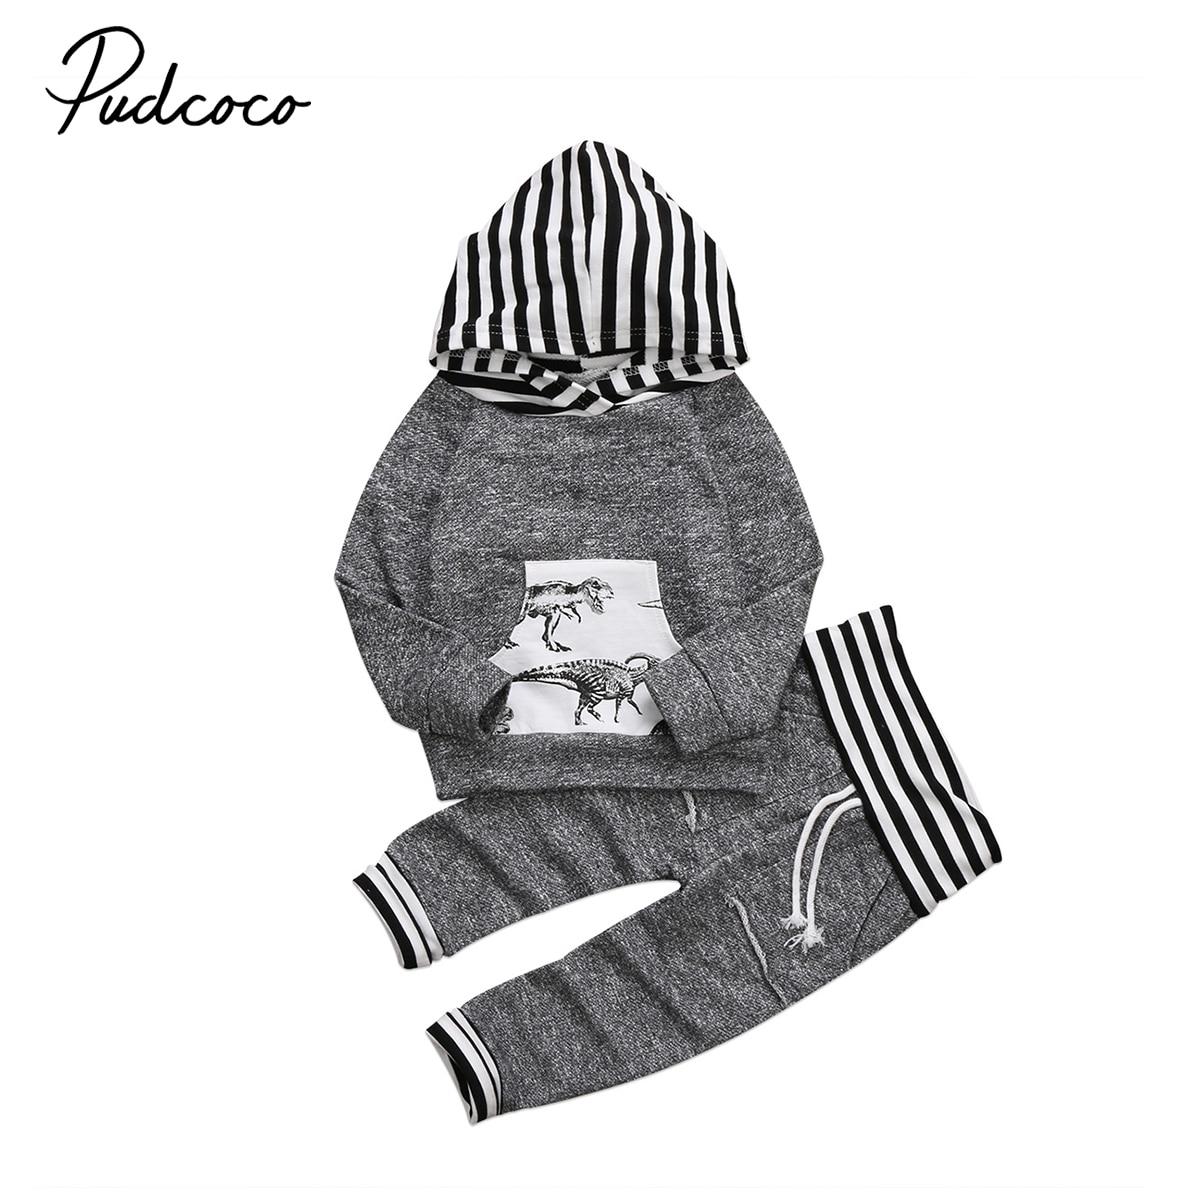 все цены на Pudcoco Cotton Newborn Kid Baby Boy Dinosaur Print Clothes Set Long Sleeve Striped Hoodies Tops Coat Long Pants Outfits